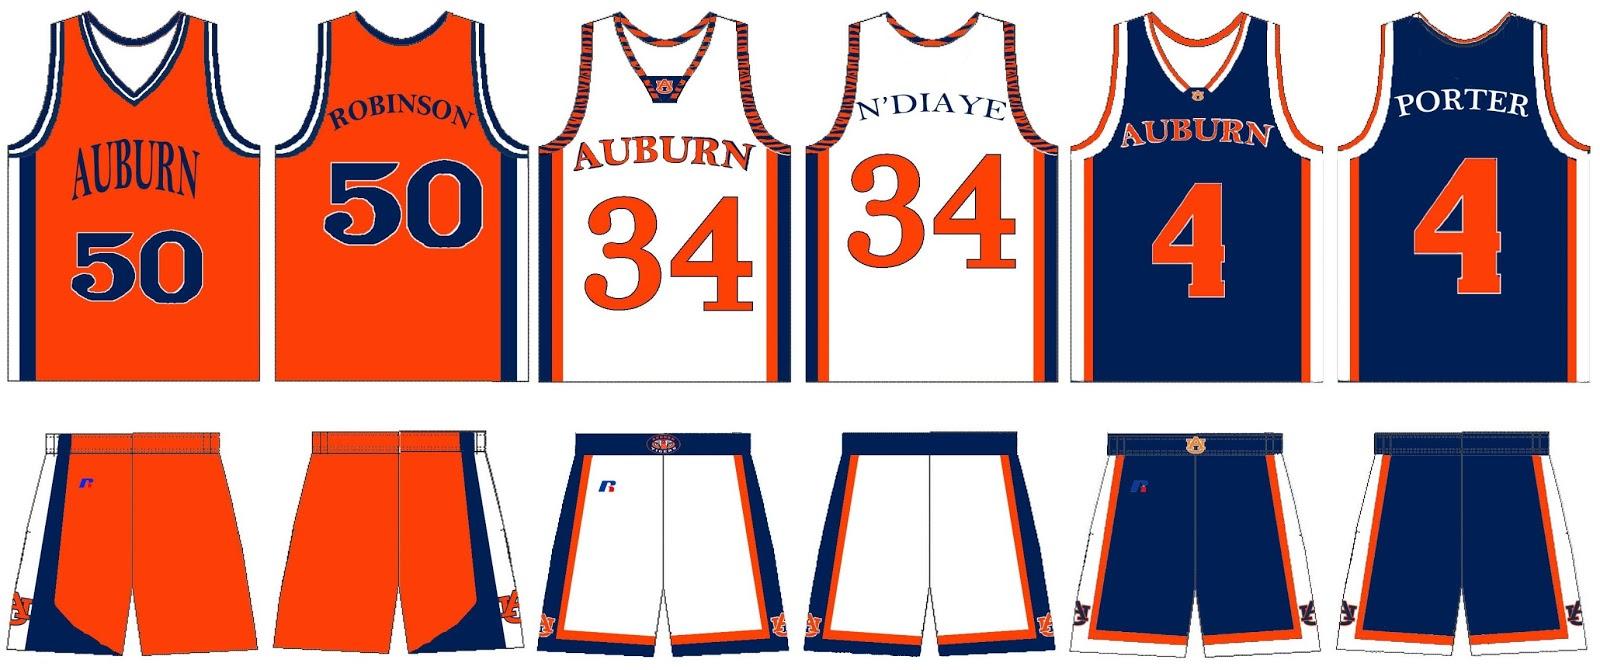 1999 2000 Auburn Uniform Database